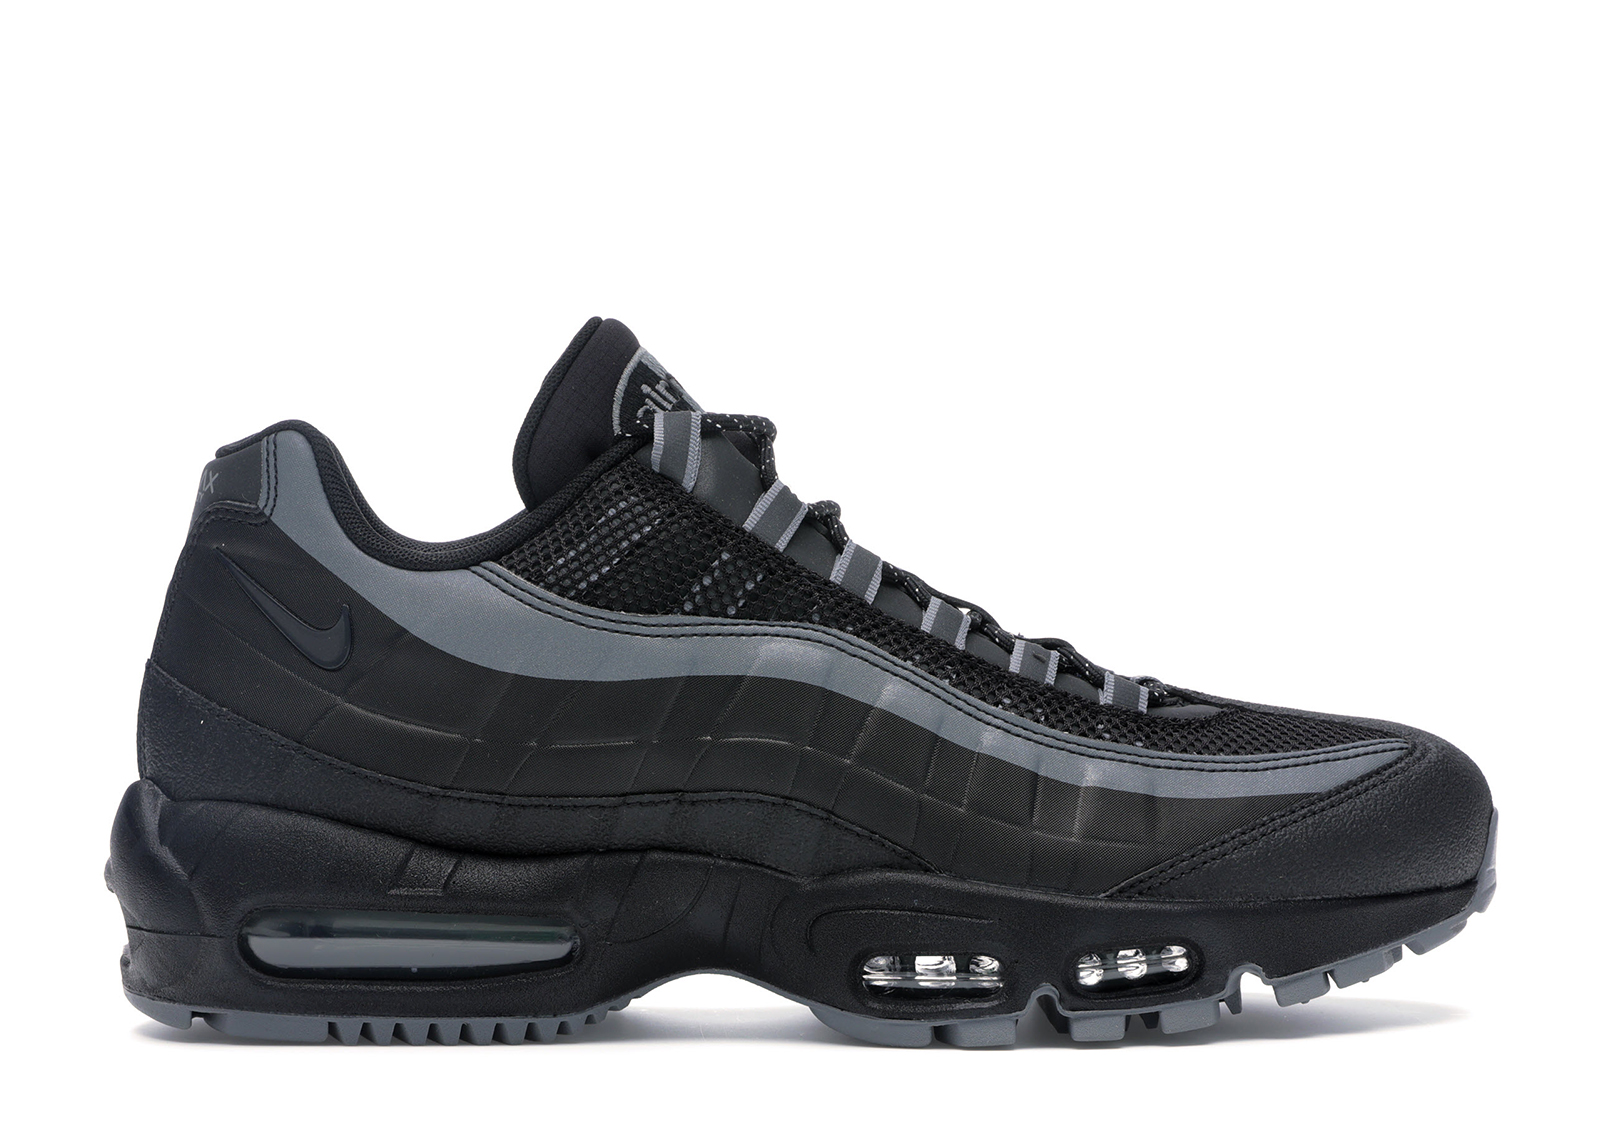 Nike Air Max 95 Utility Black Cool Grey